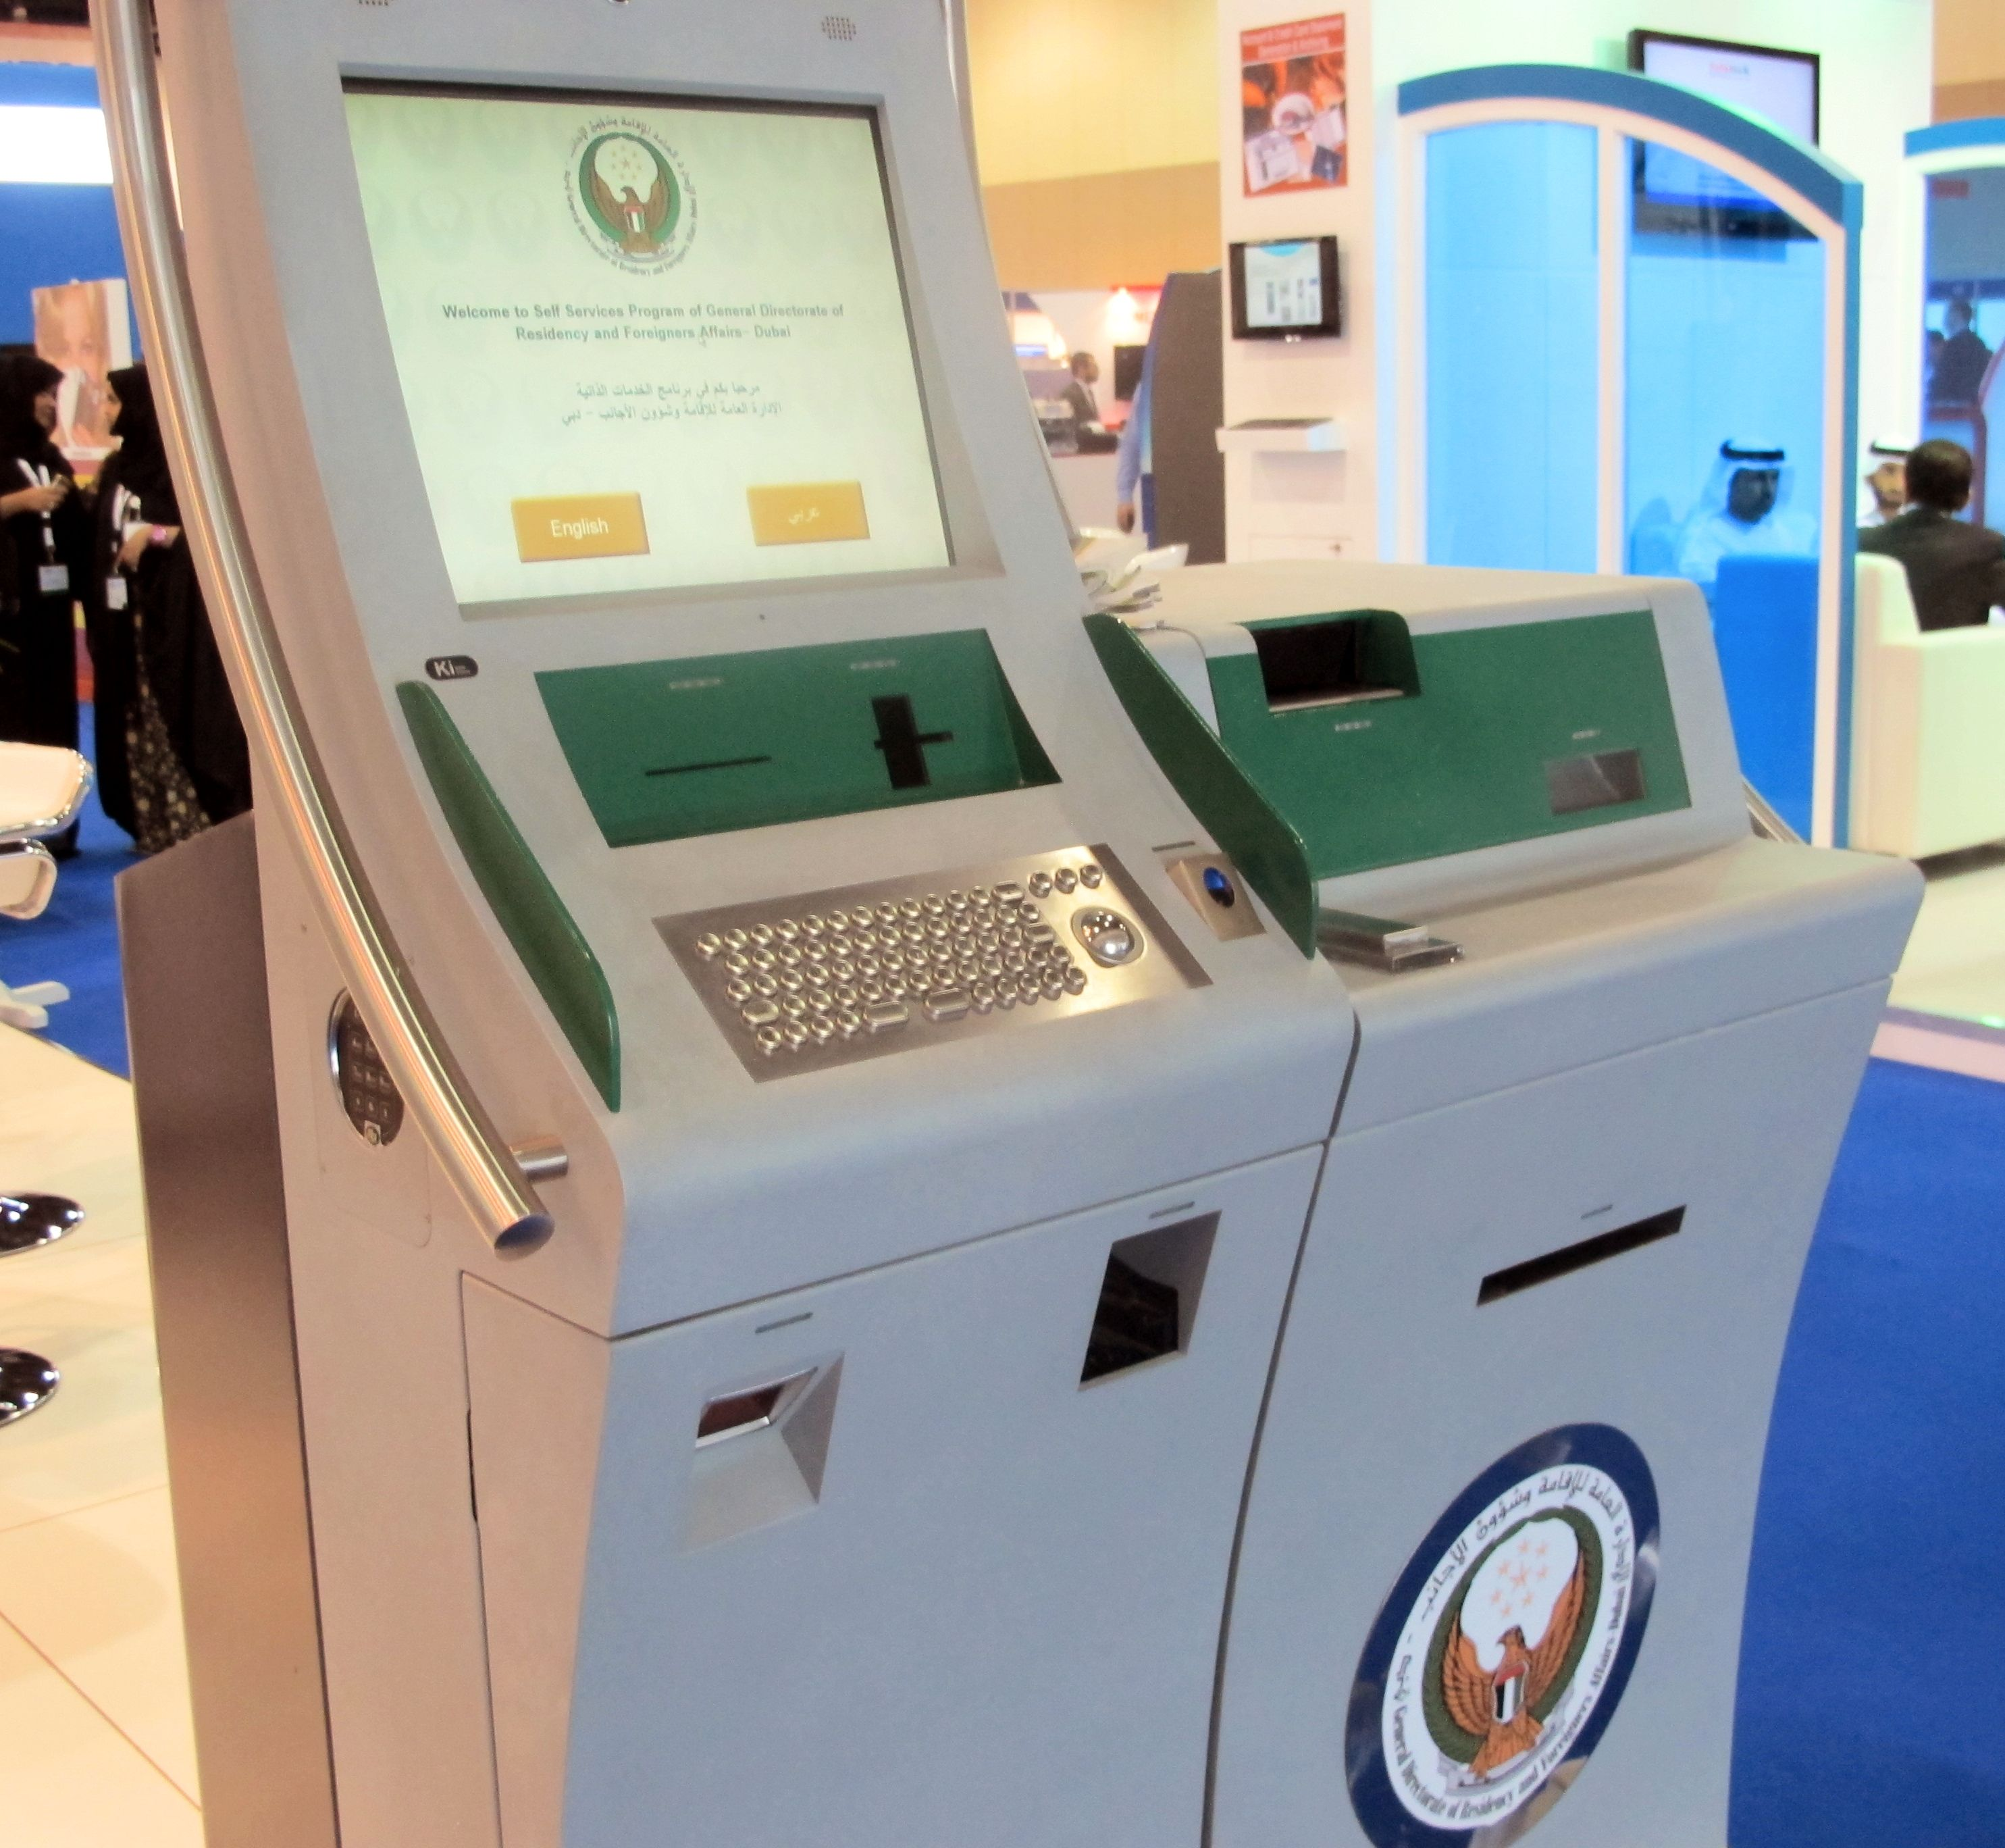 Dnrd vvisa application kiosk the kiosk accepts cash and